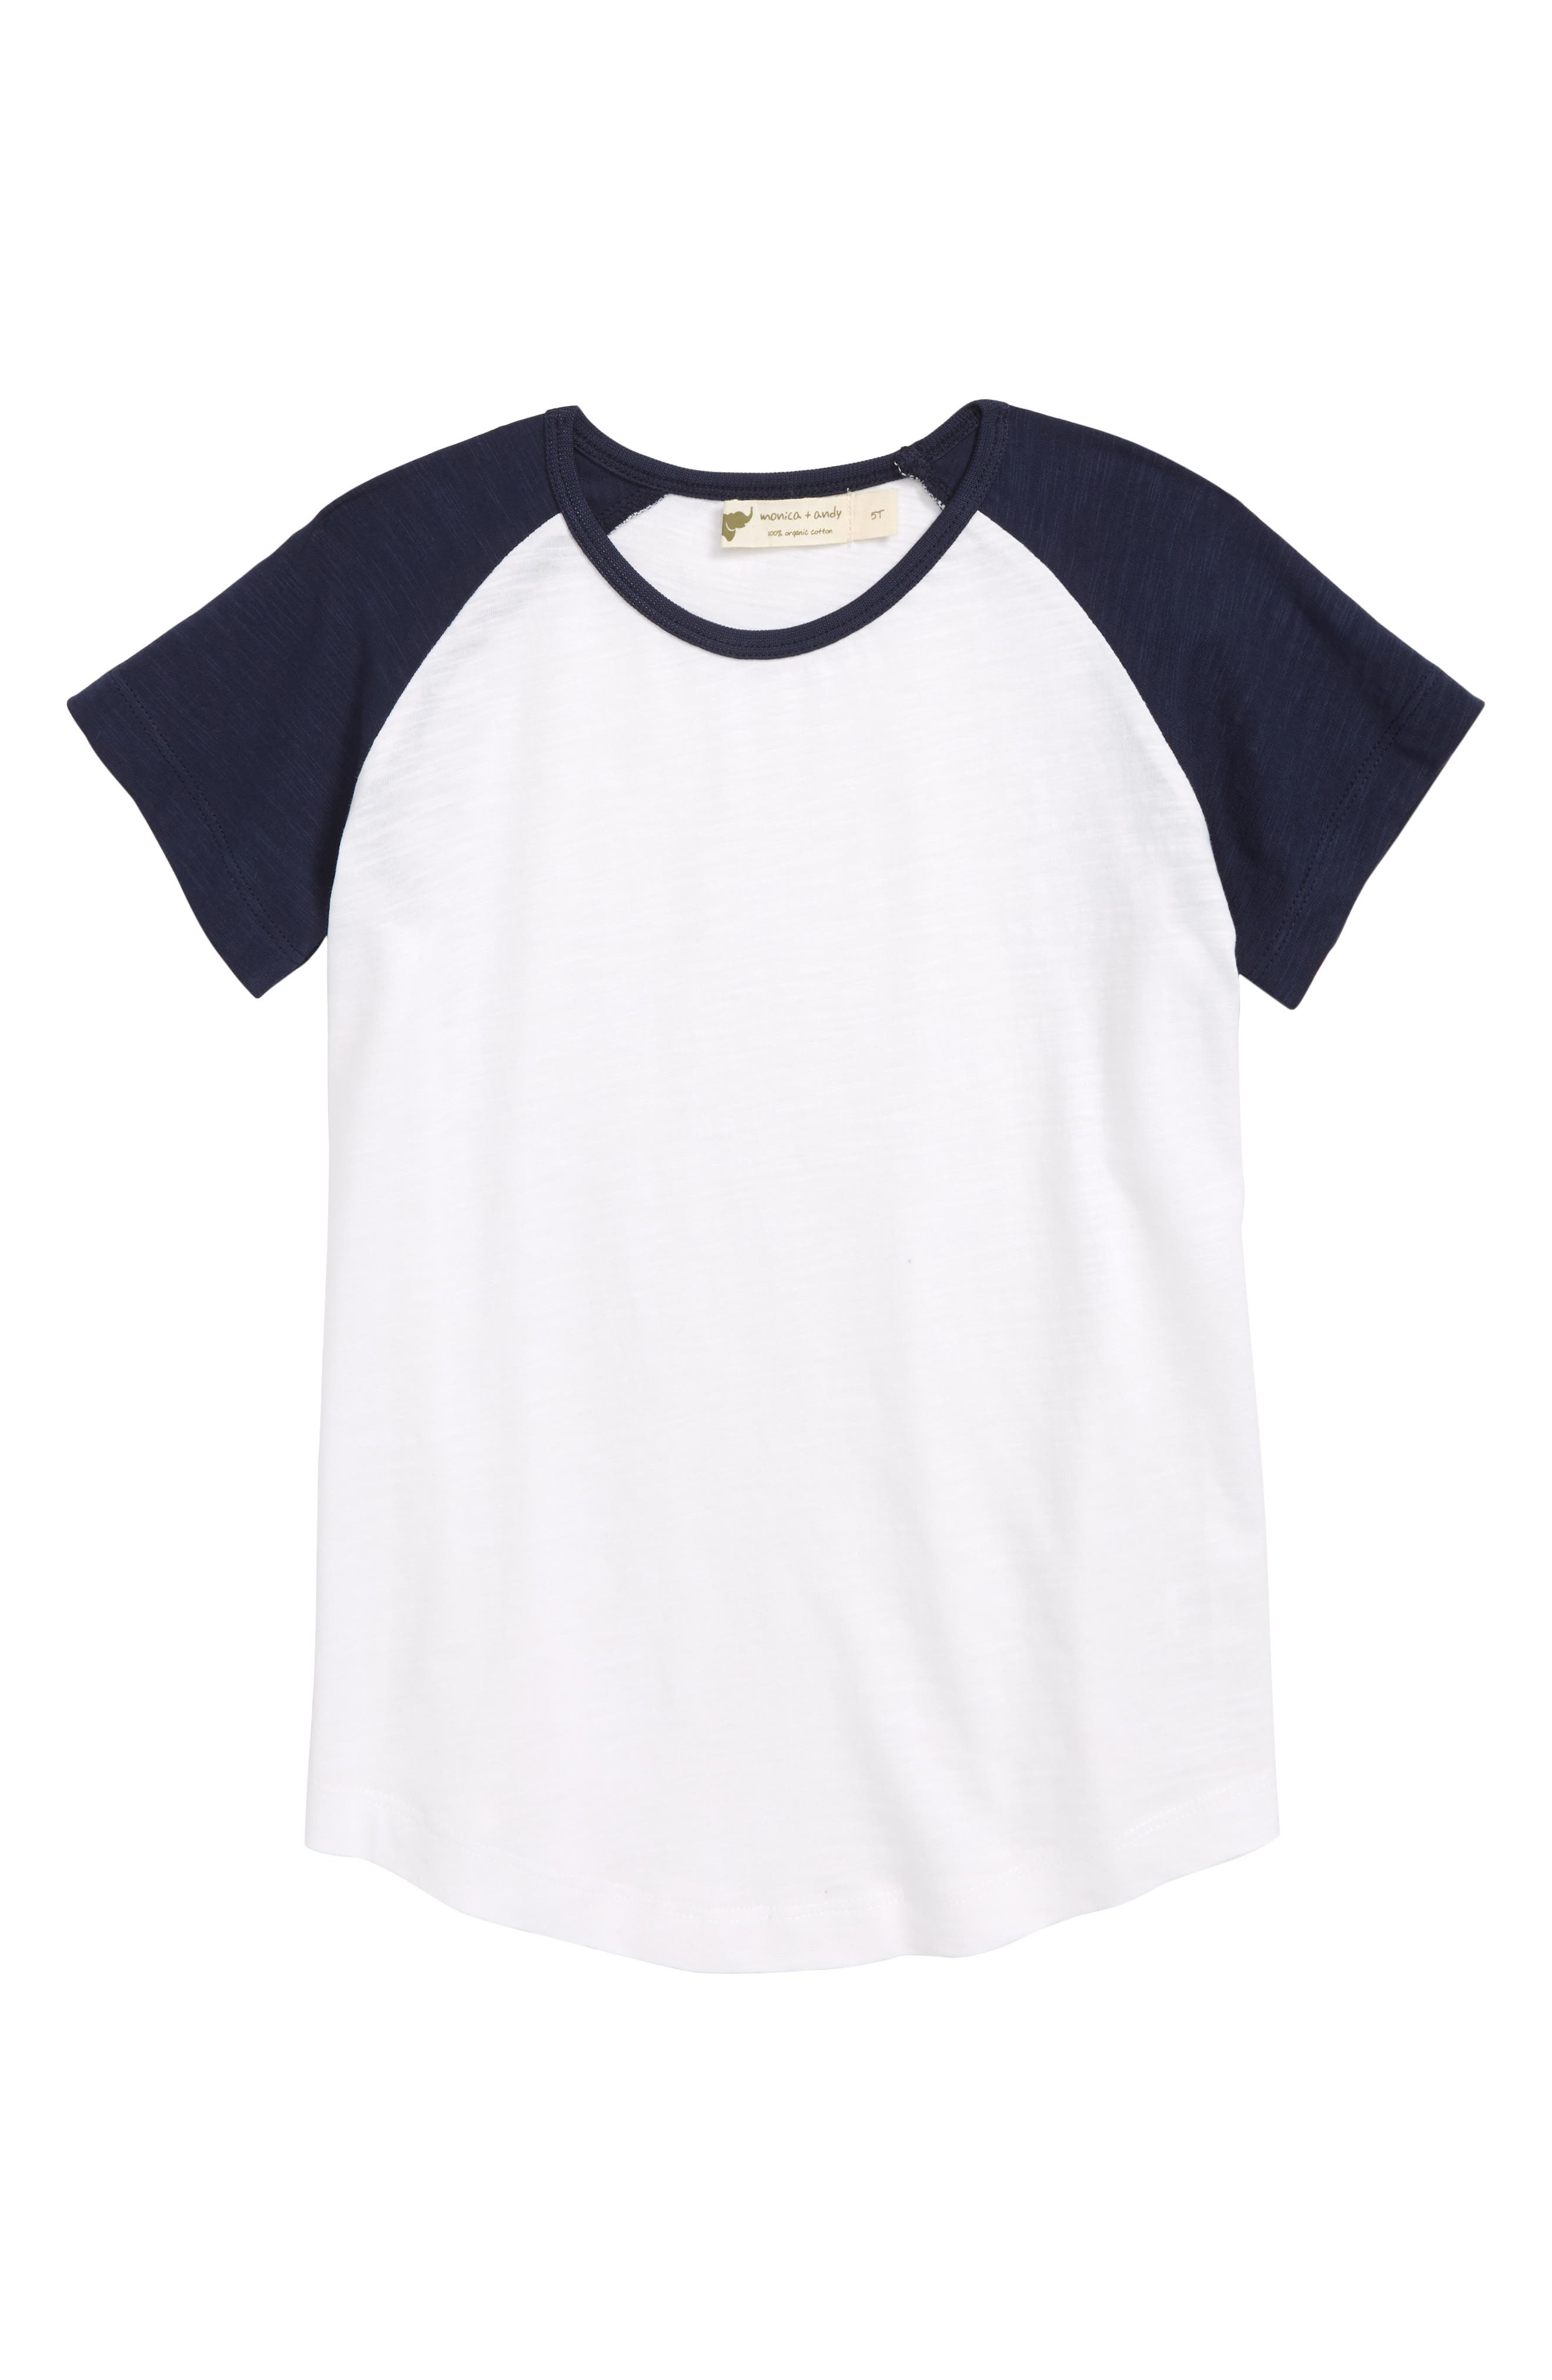 Little Slugger Organic Cotton T-Shirt,                             Main thumbnail 1, color,                             Navy/ White